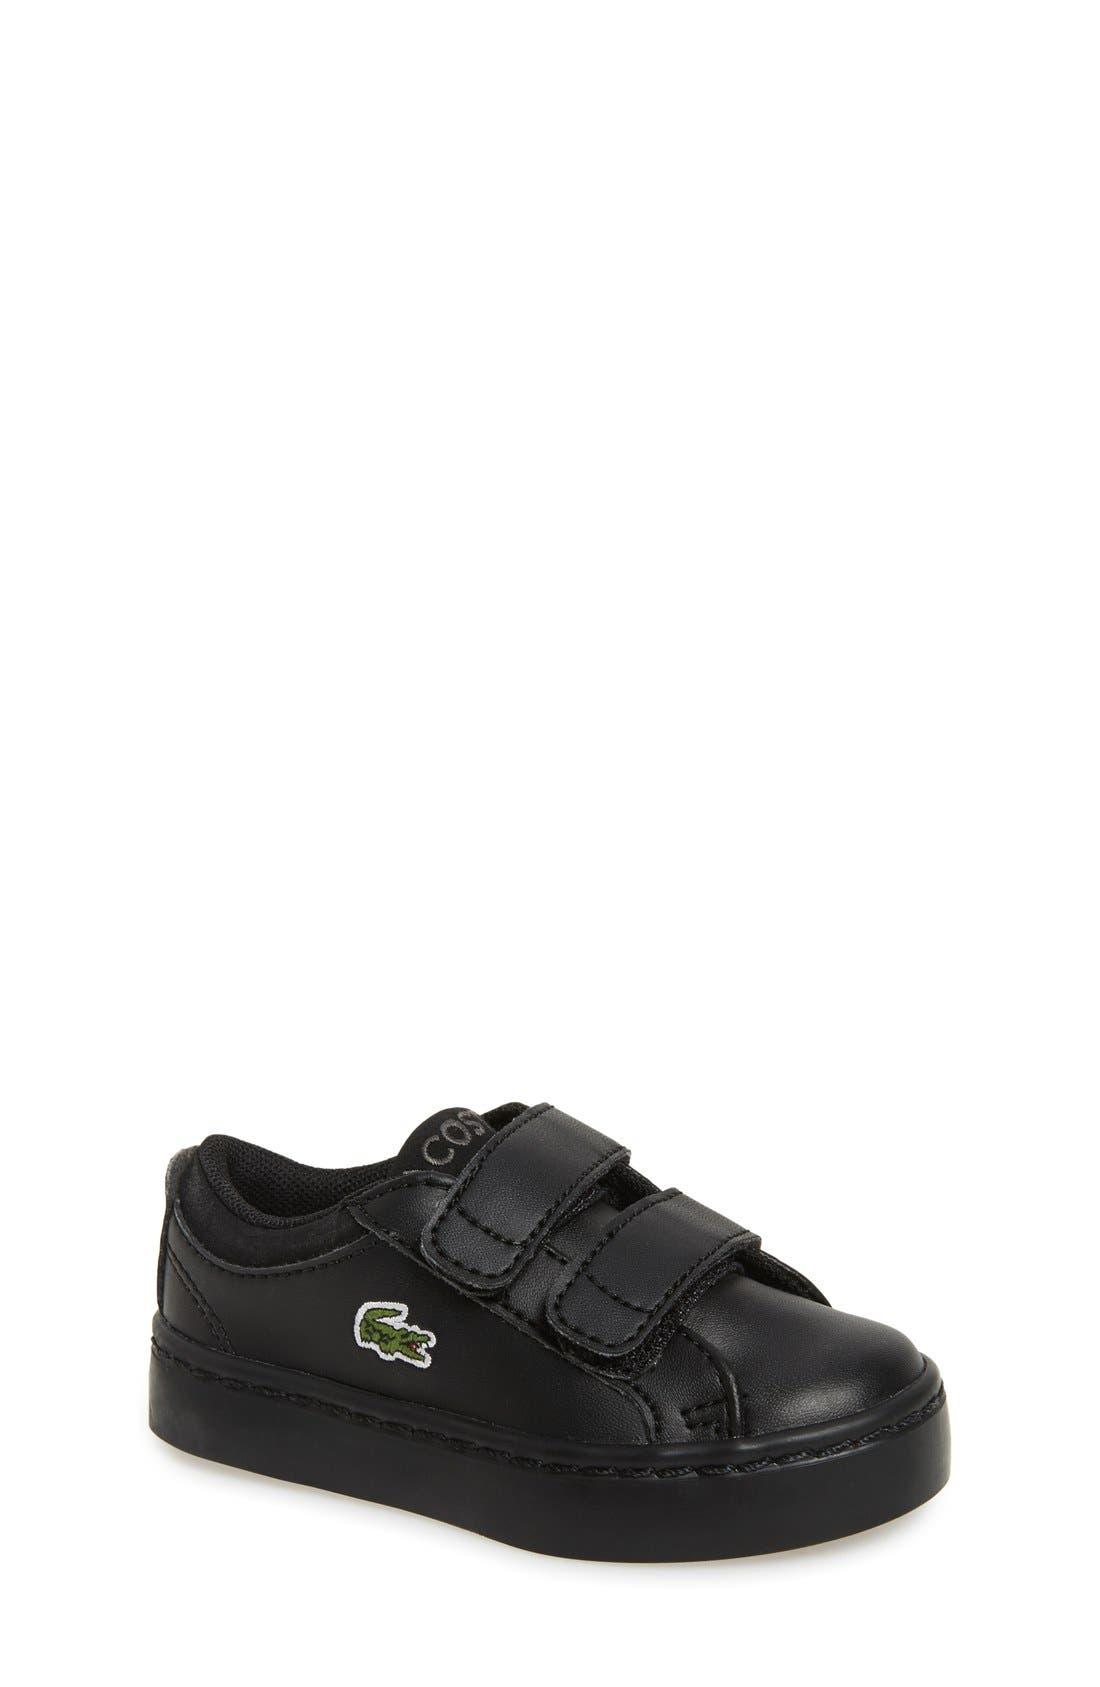 Main Image - Lacoste 'Straightset' Sneaker (Baby, Walker & Toddler)